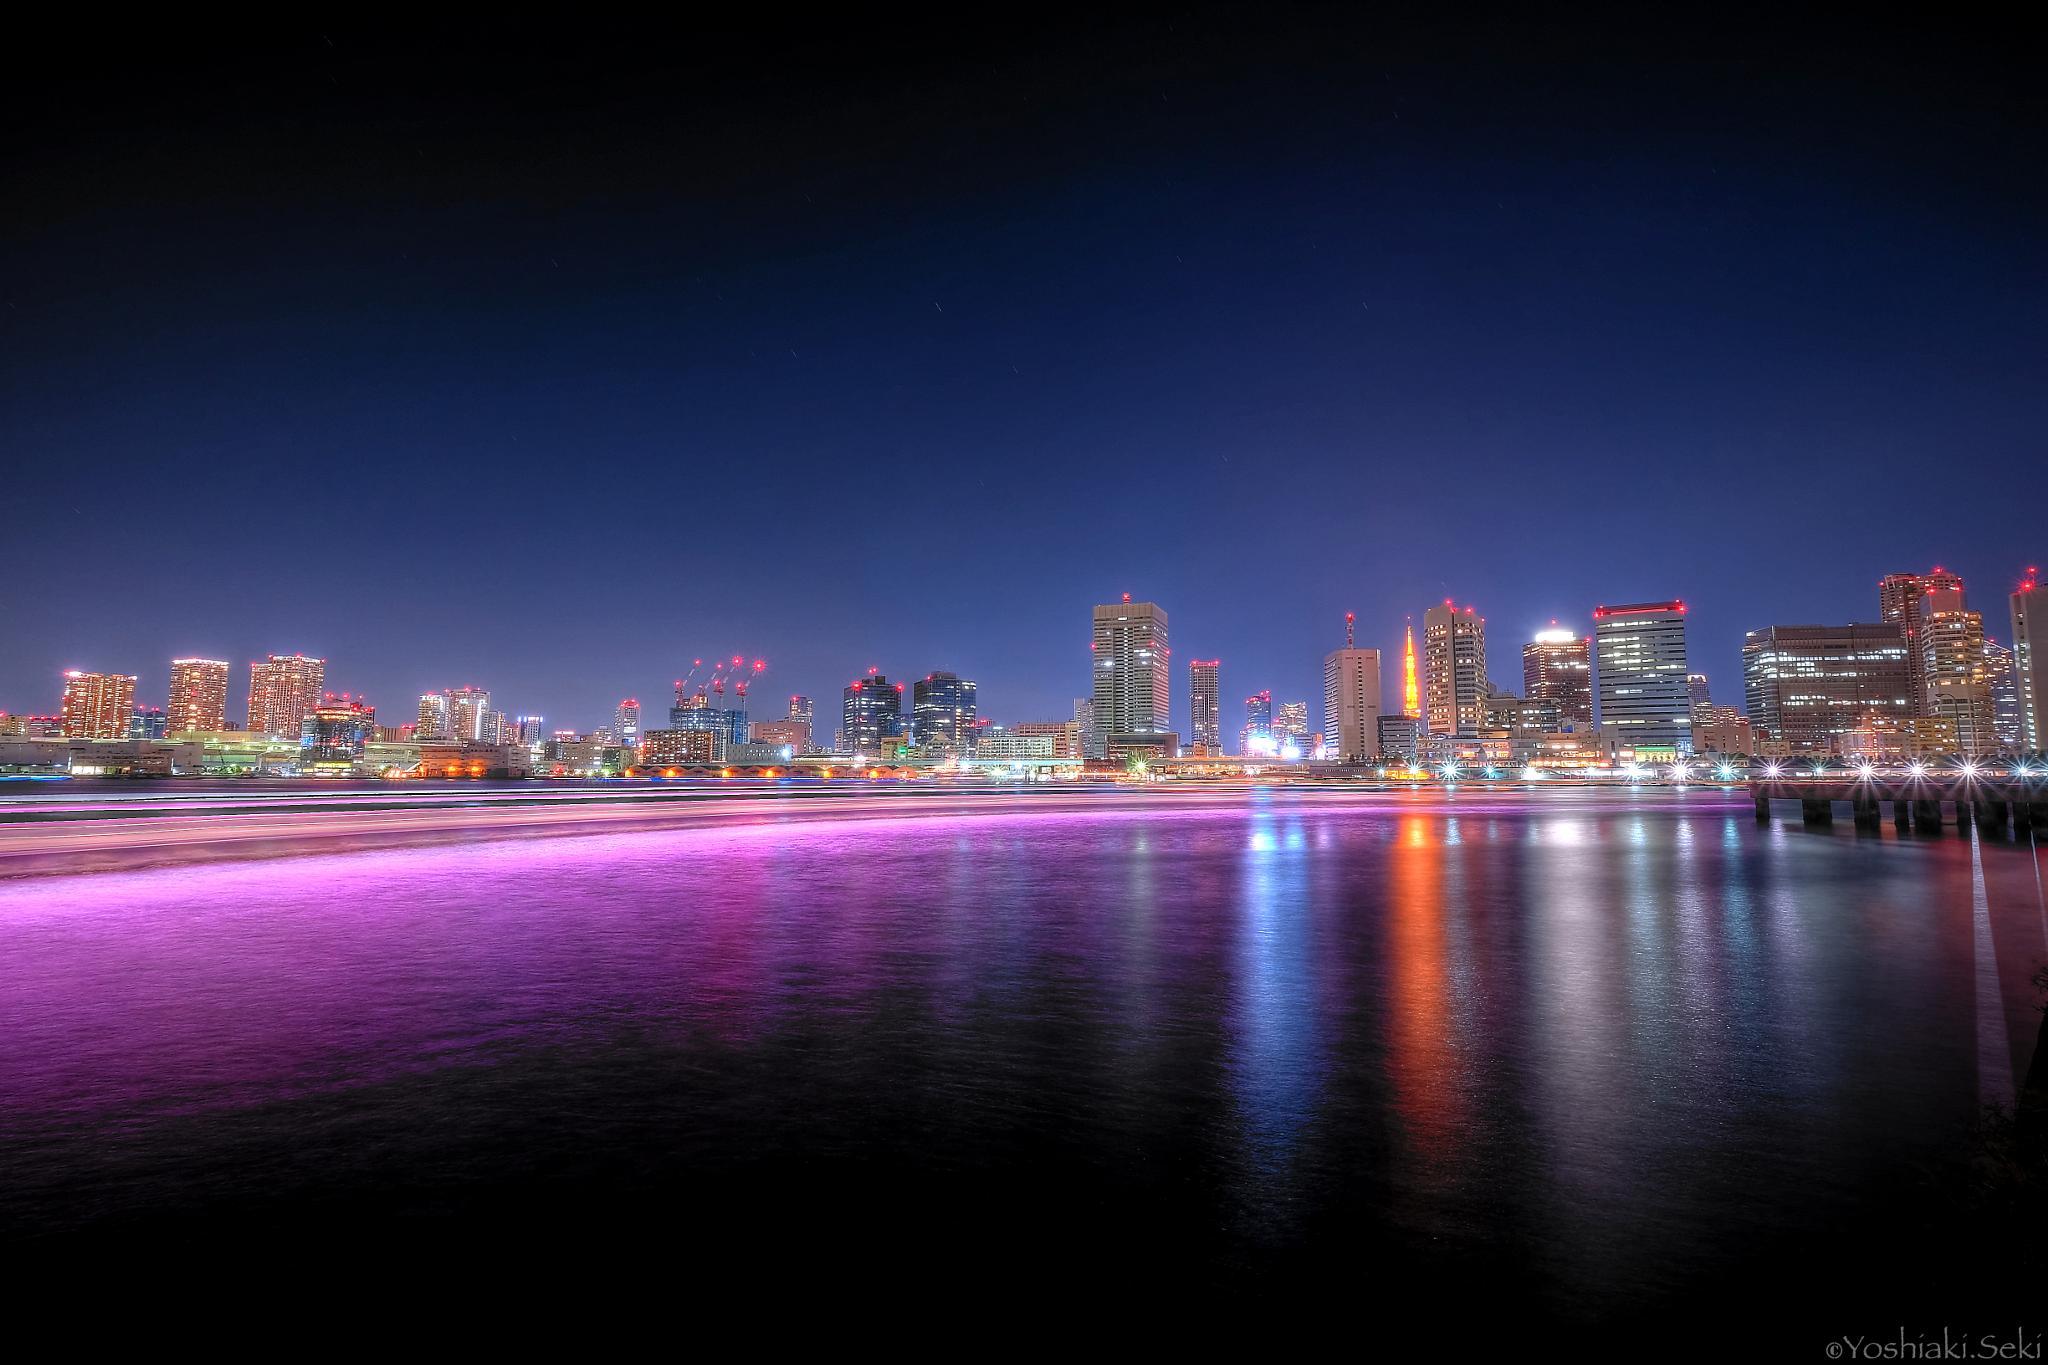 Night of the rainbow that is drawn in Tokyo Bay by Yoshiaki Seki